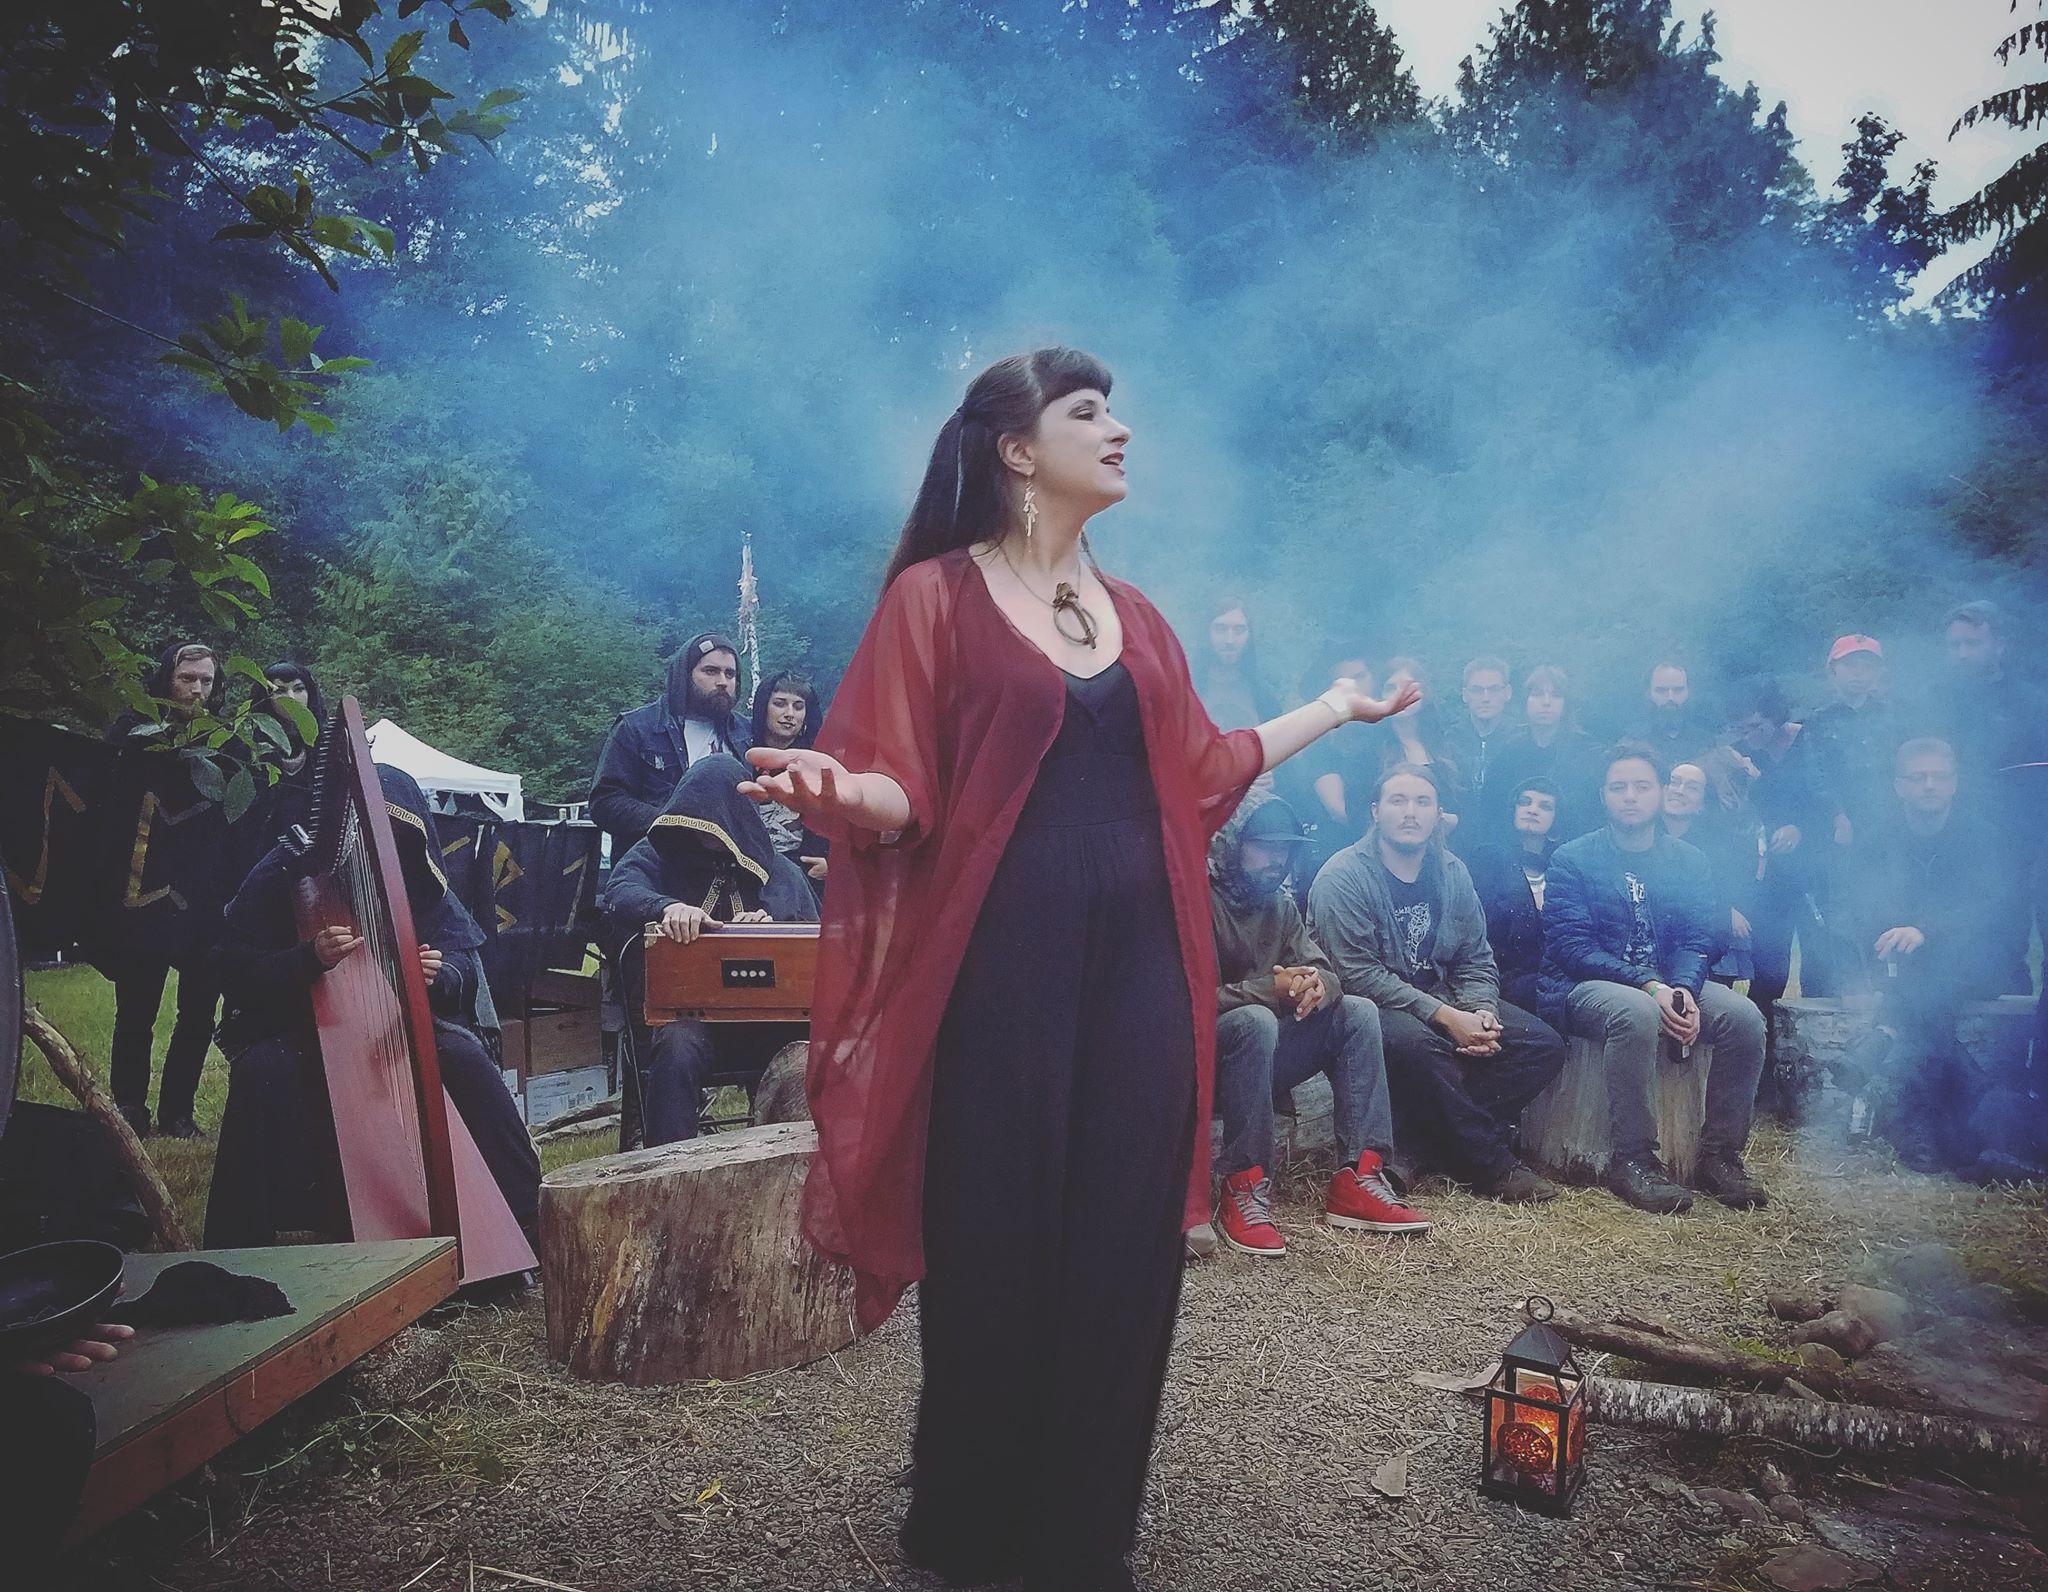 Performing with the ensemble Kertoa Kalevala, Ilana Hamilton retells the Old Norse poem  Vǫluspá . Litha Cascadia, Washington State, 2018. Image: Fjara Dawn McNally